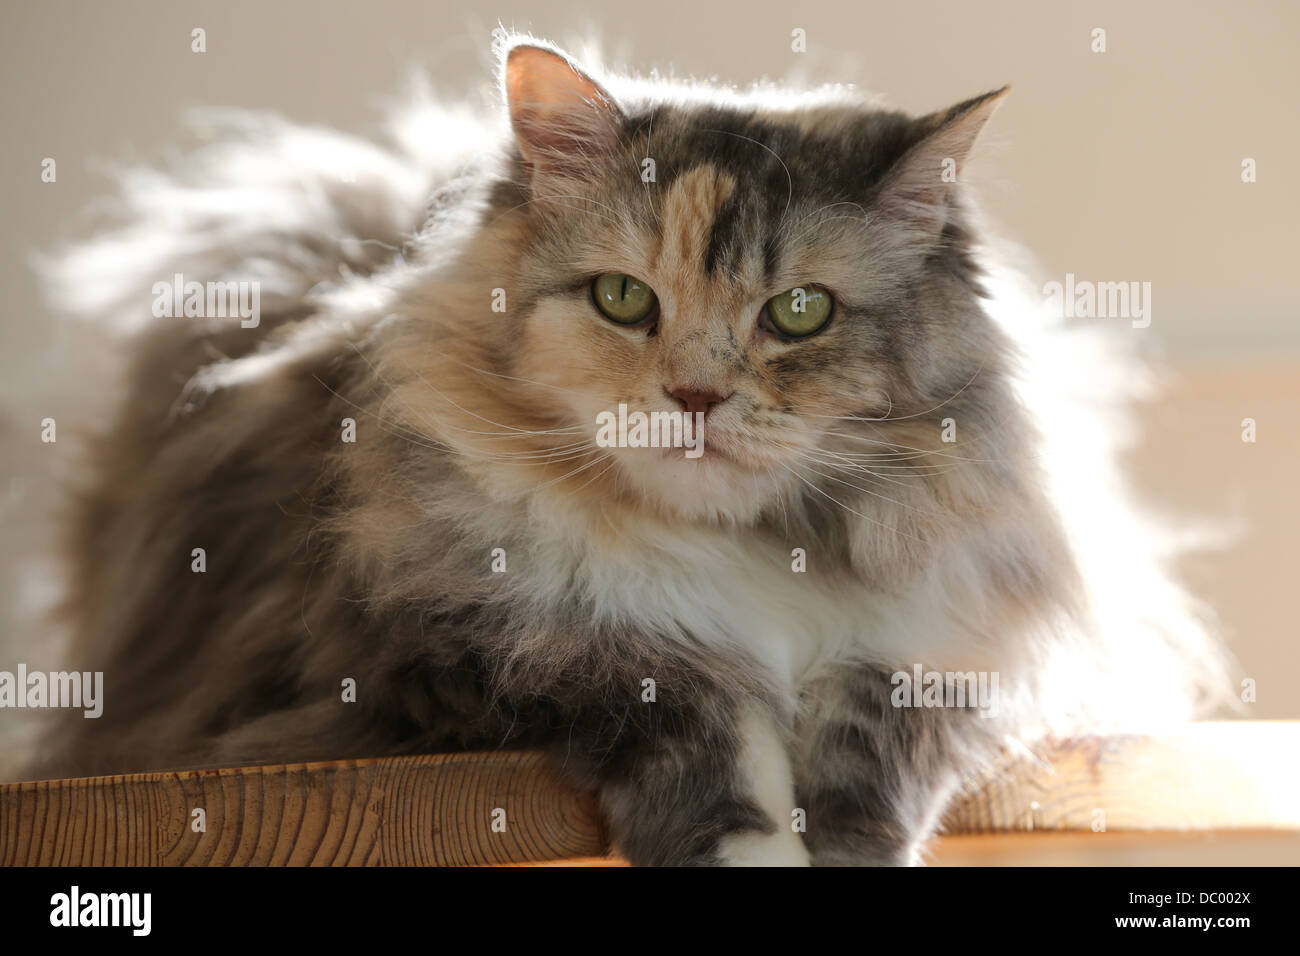 CROSS BREAD BRED PERSIAN RAGDOLL ADULT CAT SITTING ON A TABLE